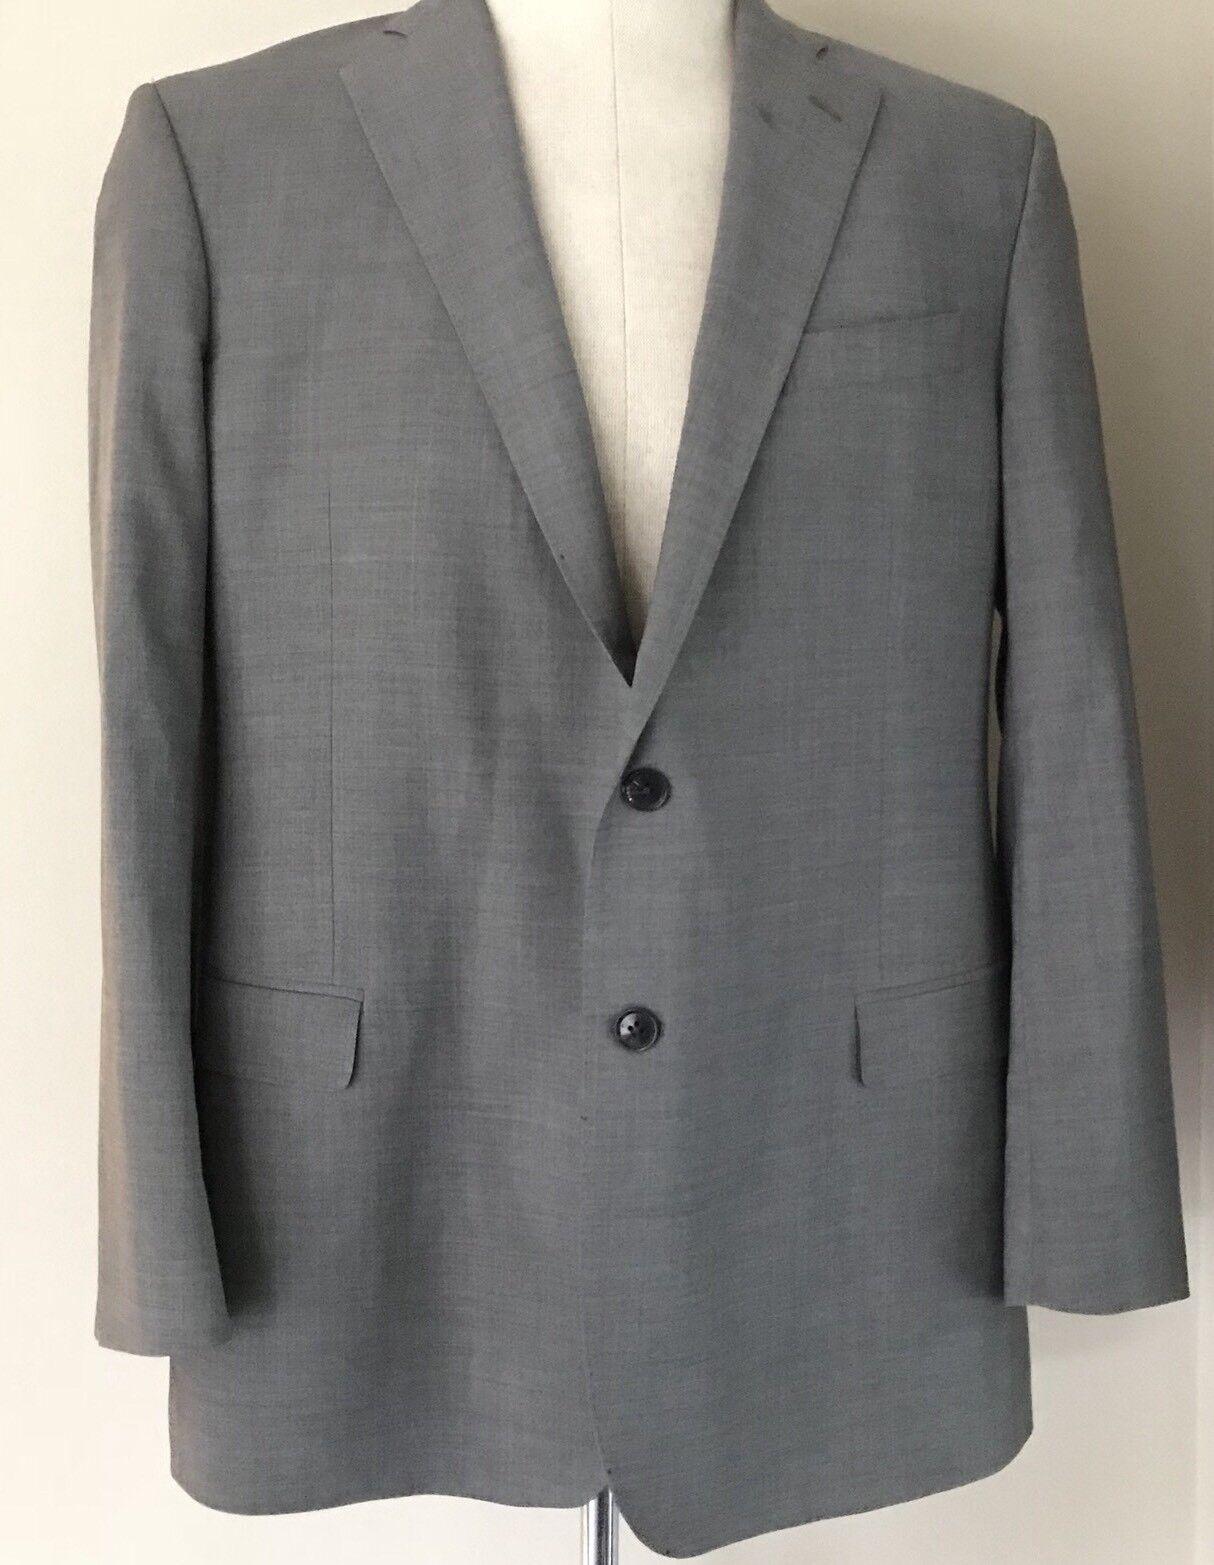 Brooks Brothers 346 Glen Plaid grau Wolle Sport Mantel Jacket Blazer 43R